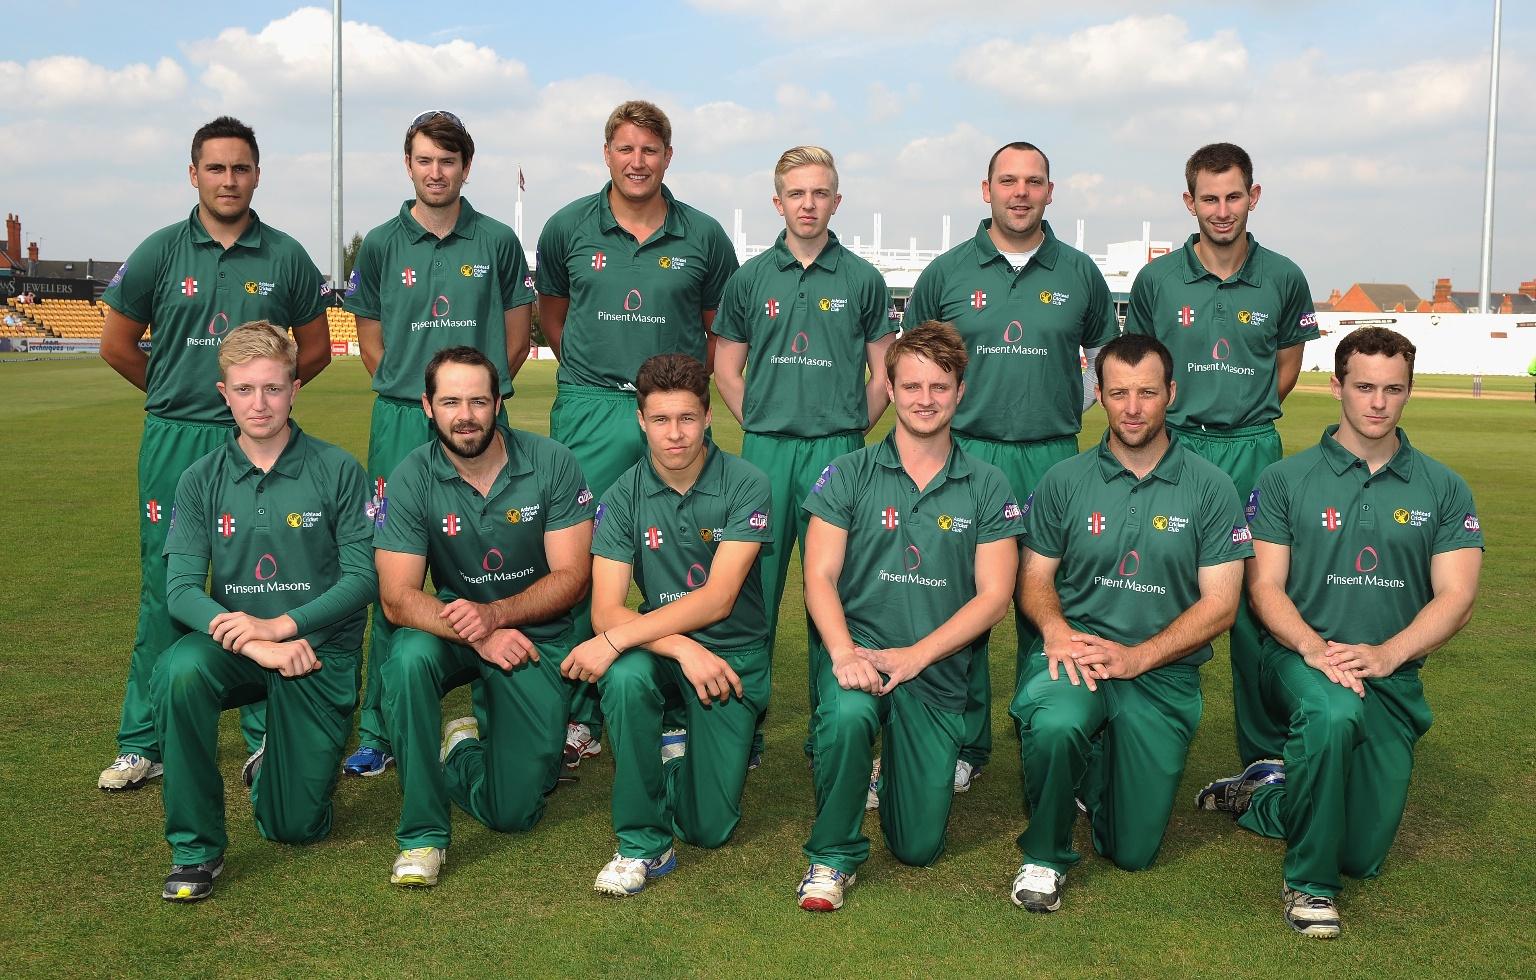 Ashtead CC - runners up Natwest Club T20 2014